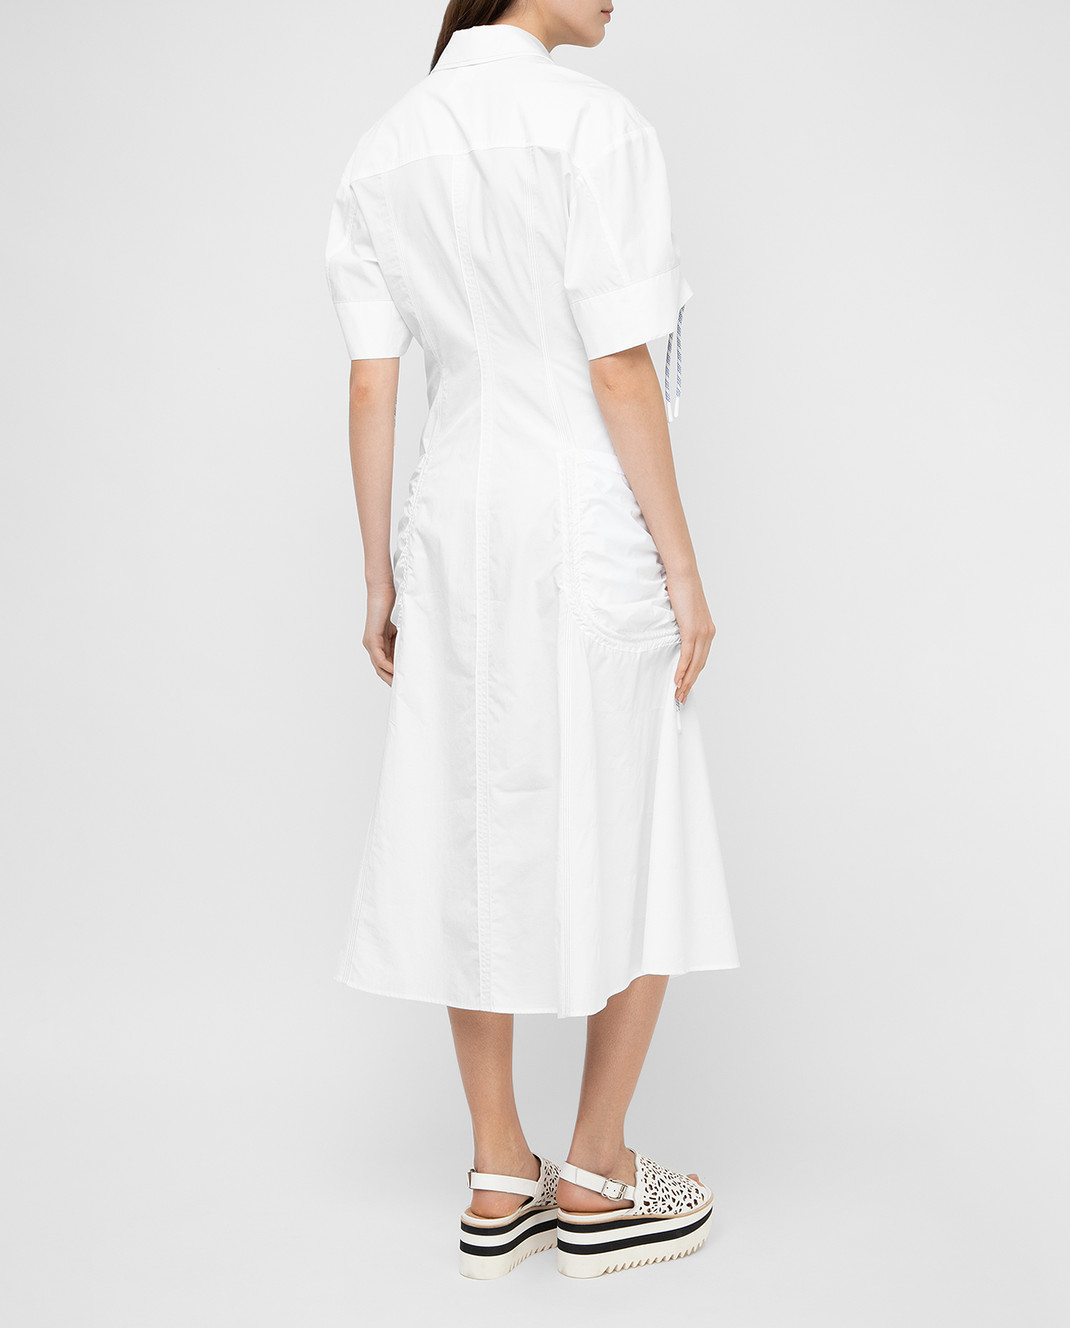 Max Mara Sportmax Белое платье  ELMI изображение 4